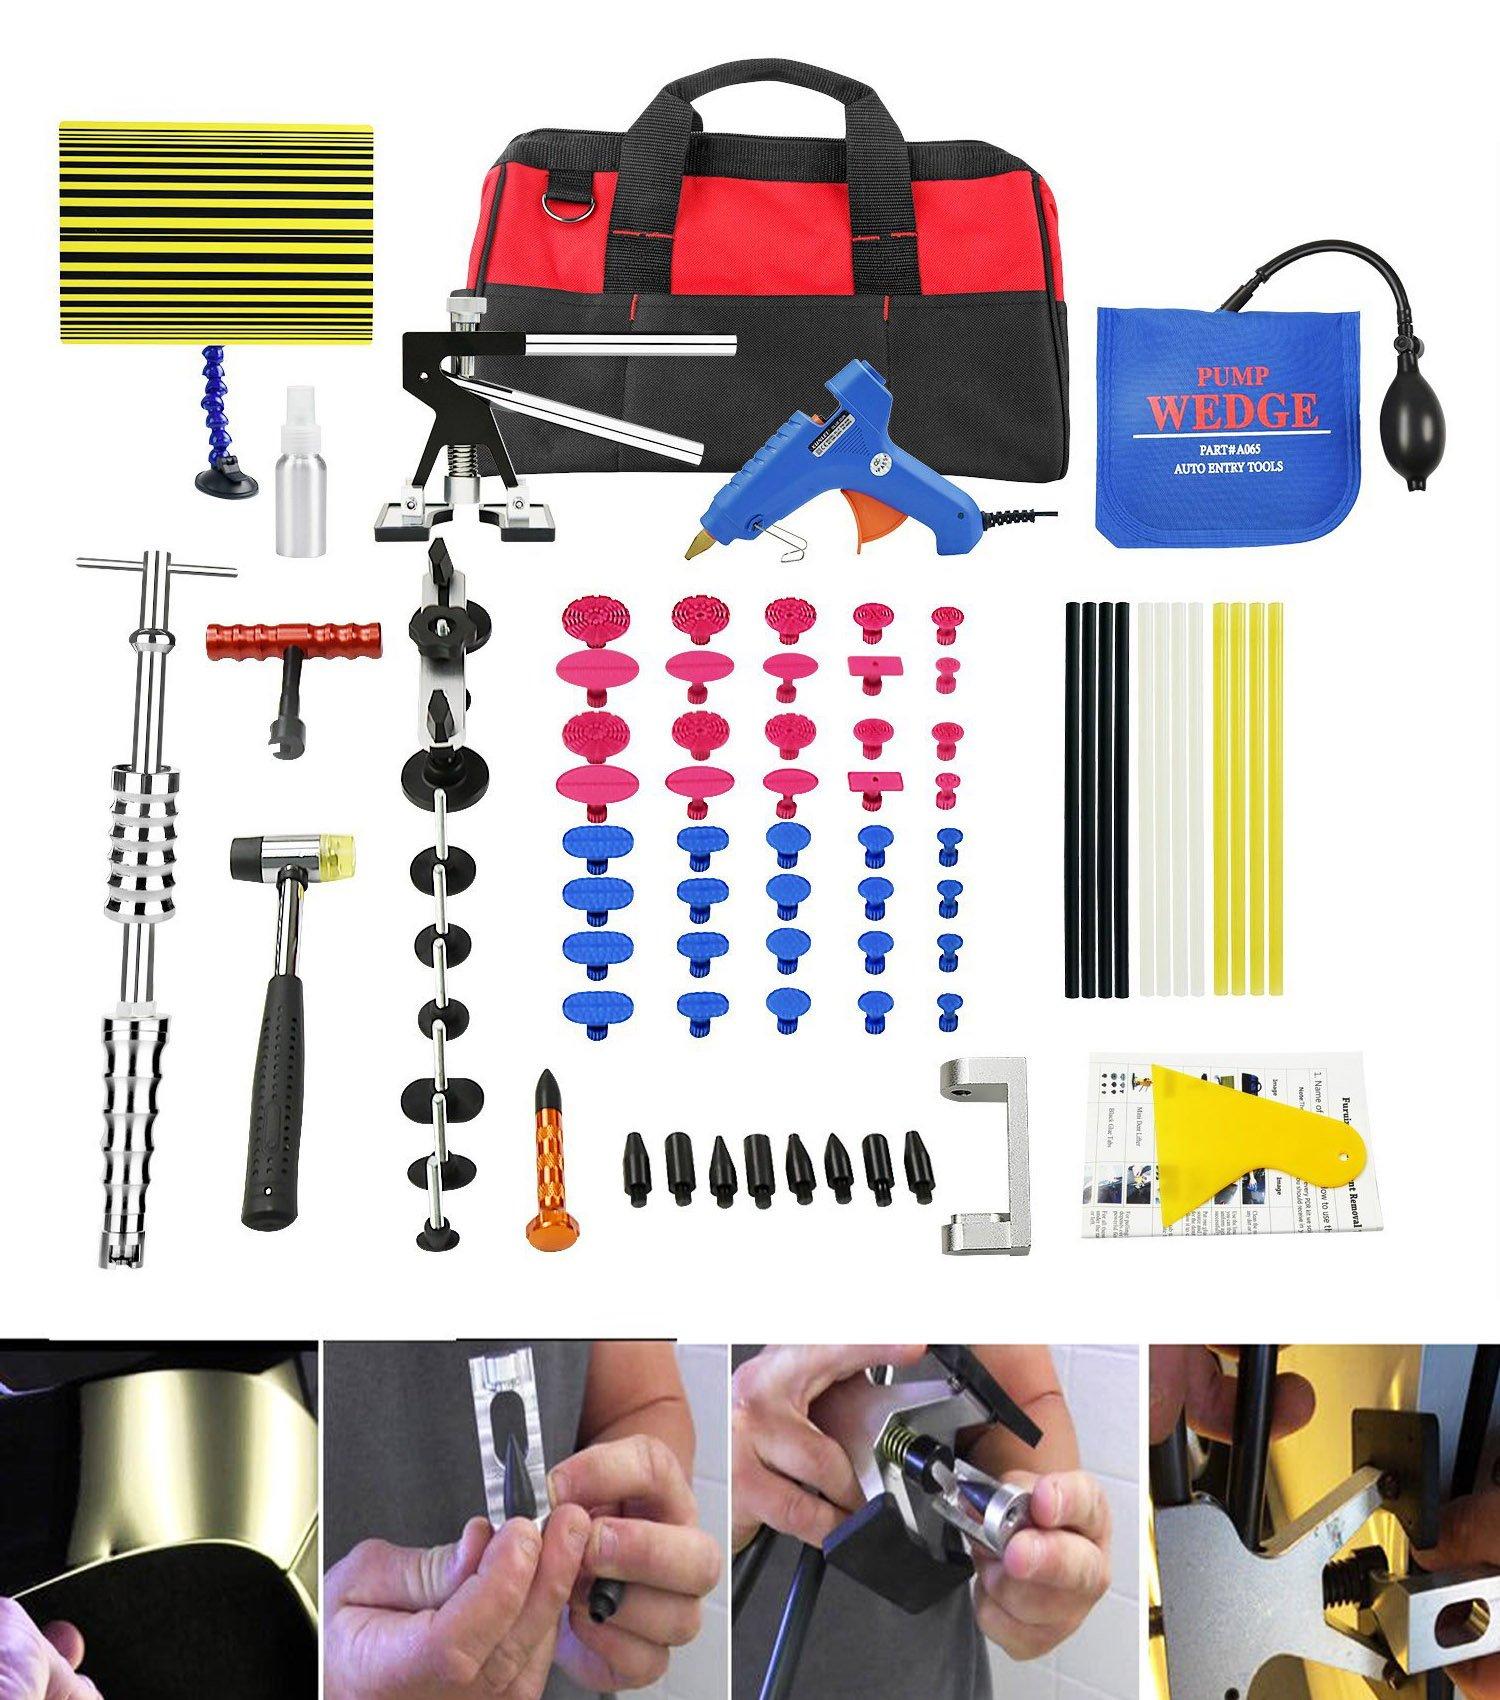 PDR Tools Paintless Dent Repair Tools with Aluminium Edge Jack for Car Dent Repair Door Ding Removal Bridge Dent Puller Dent Removal Kits